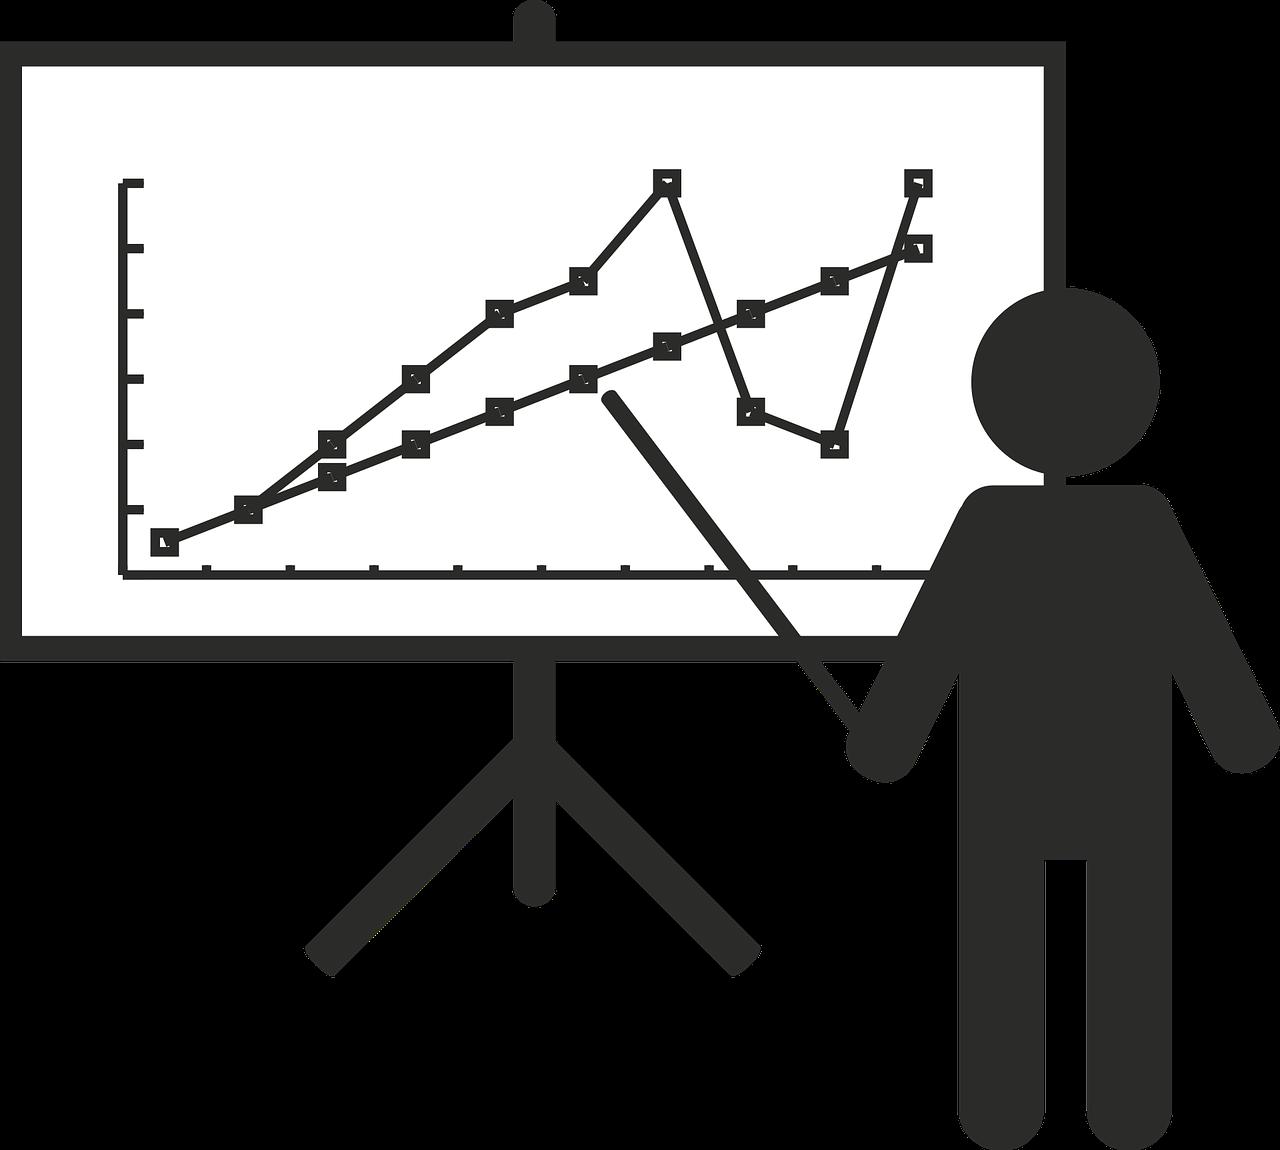 Diversity clipart powerpoint background. Public speaking nature com